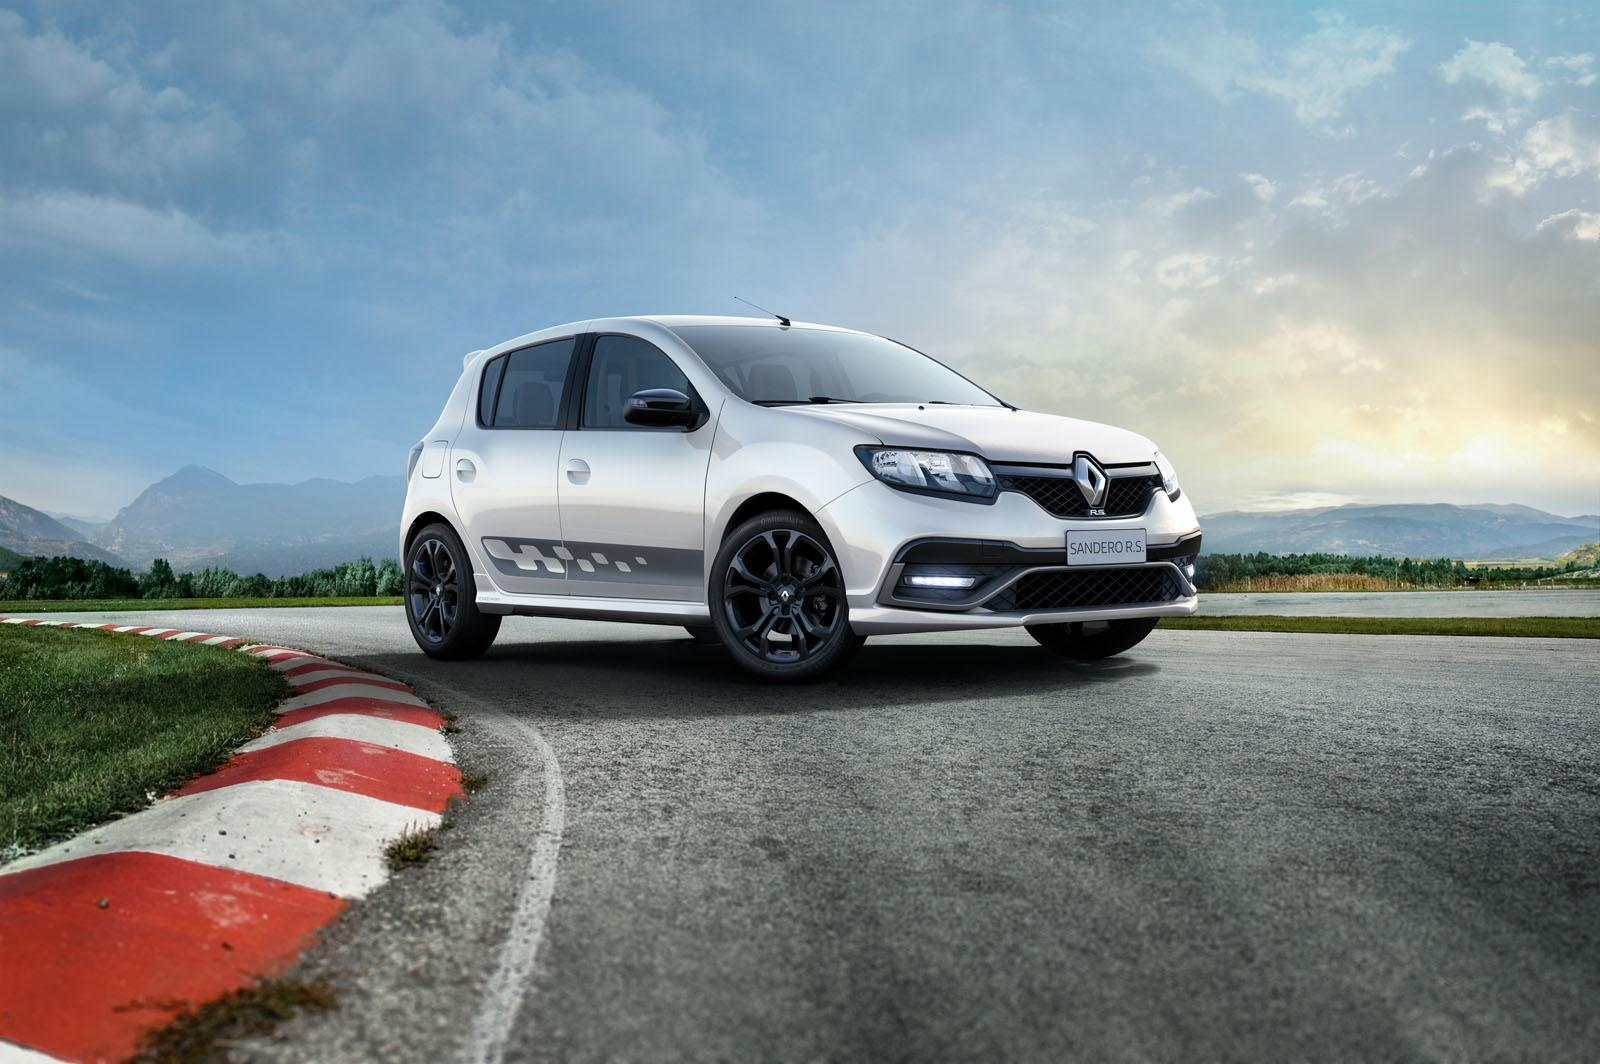 Foto de Renault Sandero R.S 2.0 (1/8)